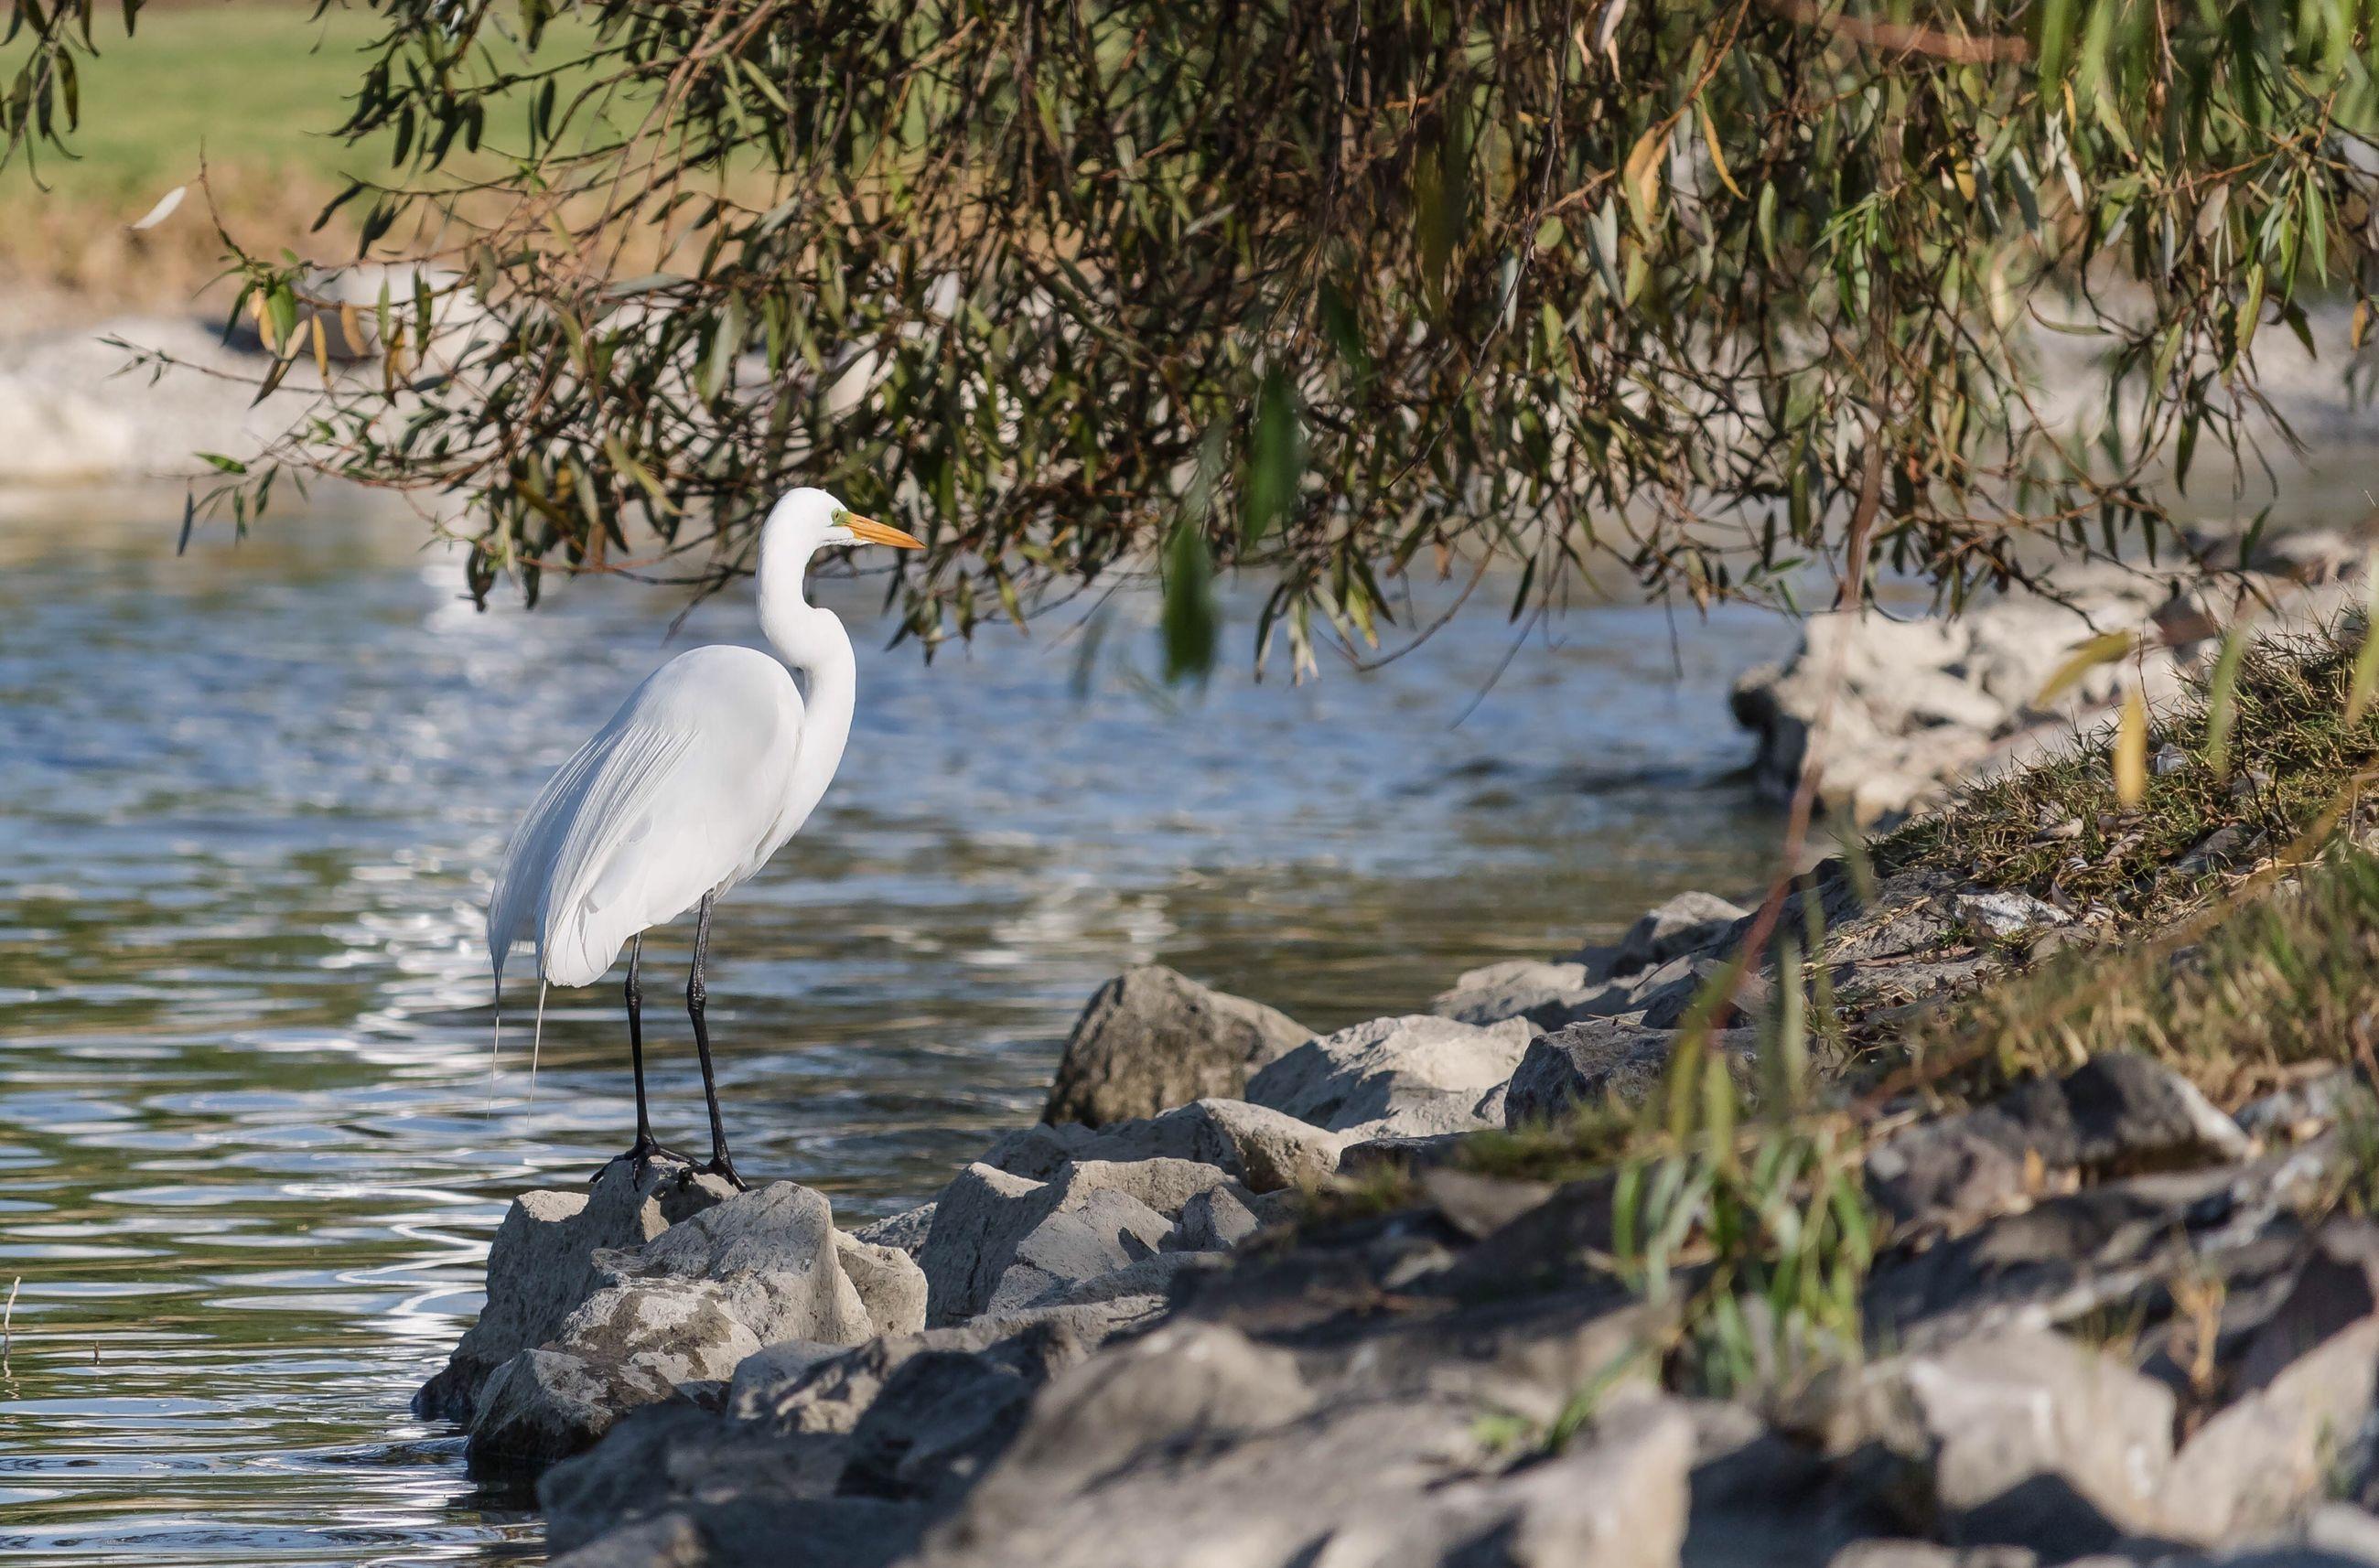 bird, animal wildlife, animals in the wild, no people, nature, day, tree, heron, outdoors, egret, perching